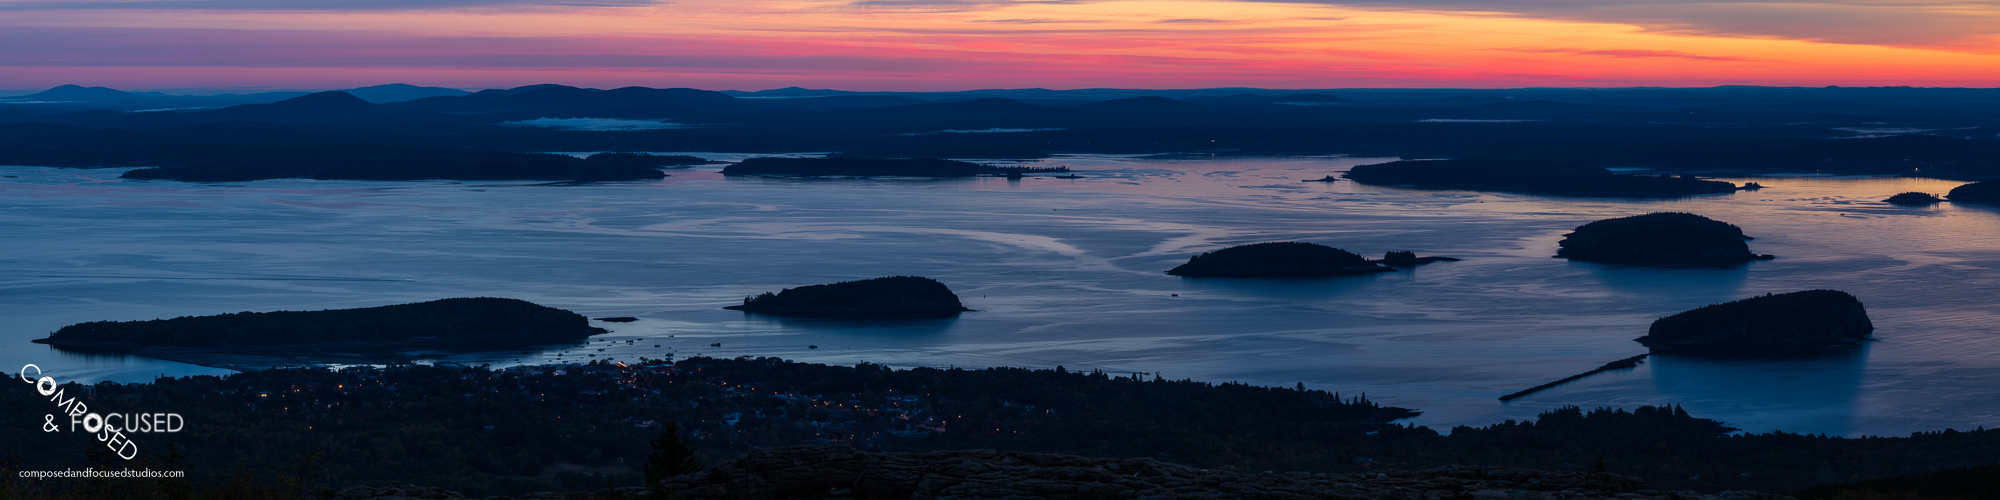 Sunrise over Bar Harbor, Maine